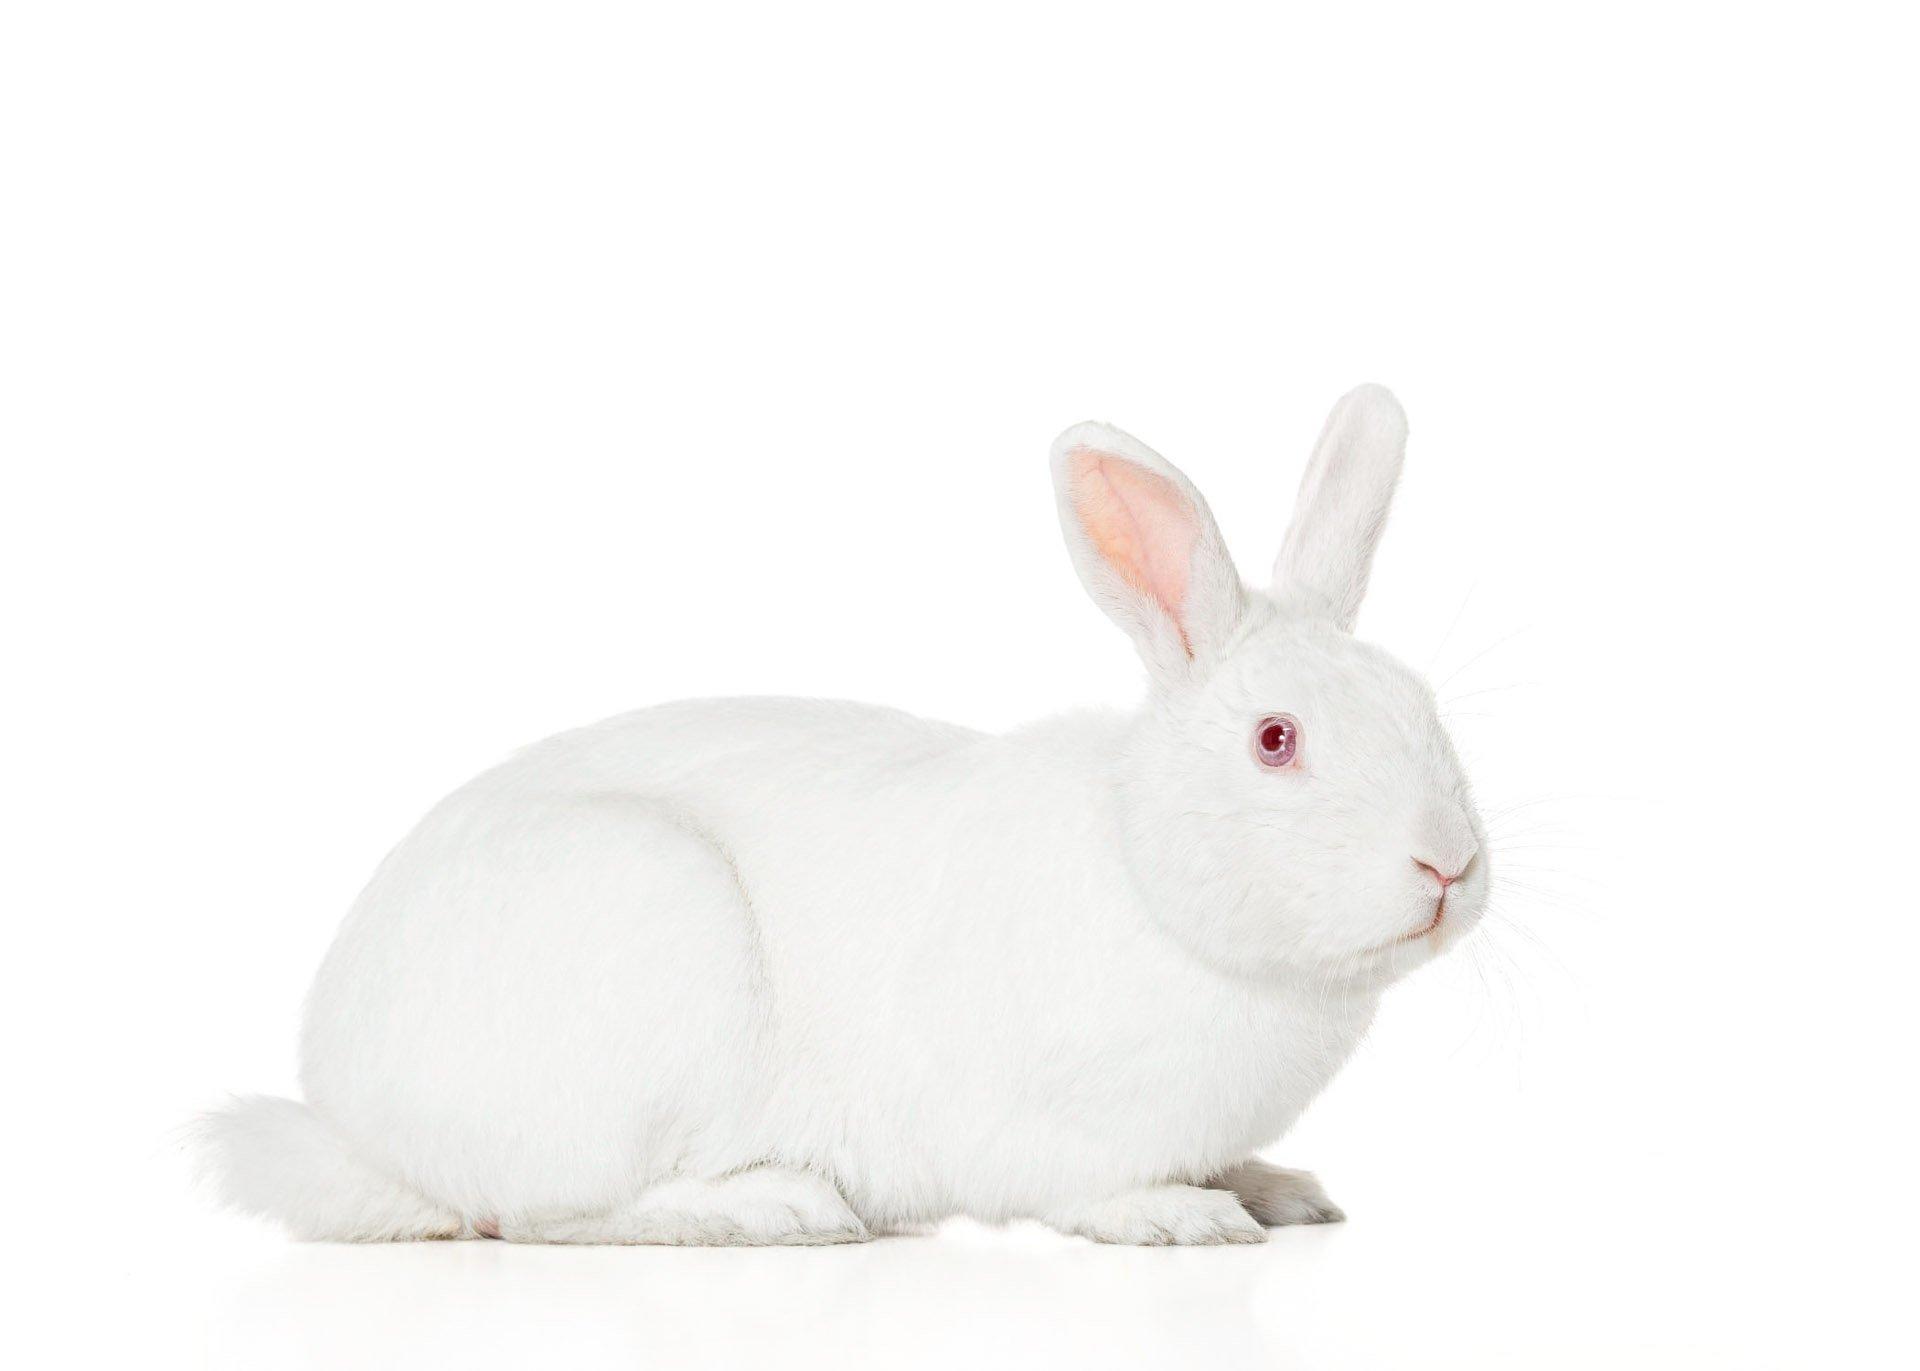 rabbit-bunny-therapy-animal-albino